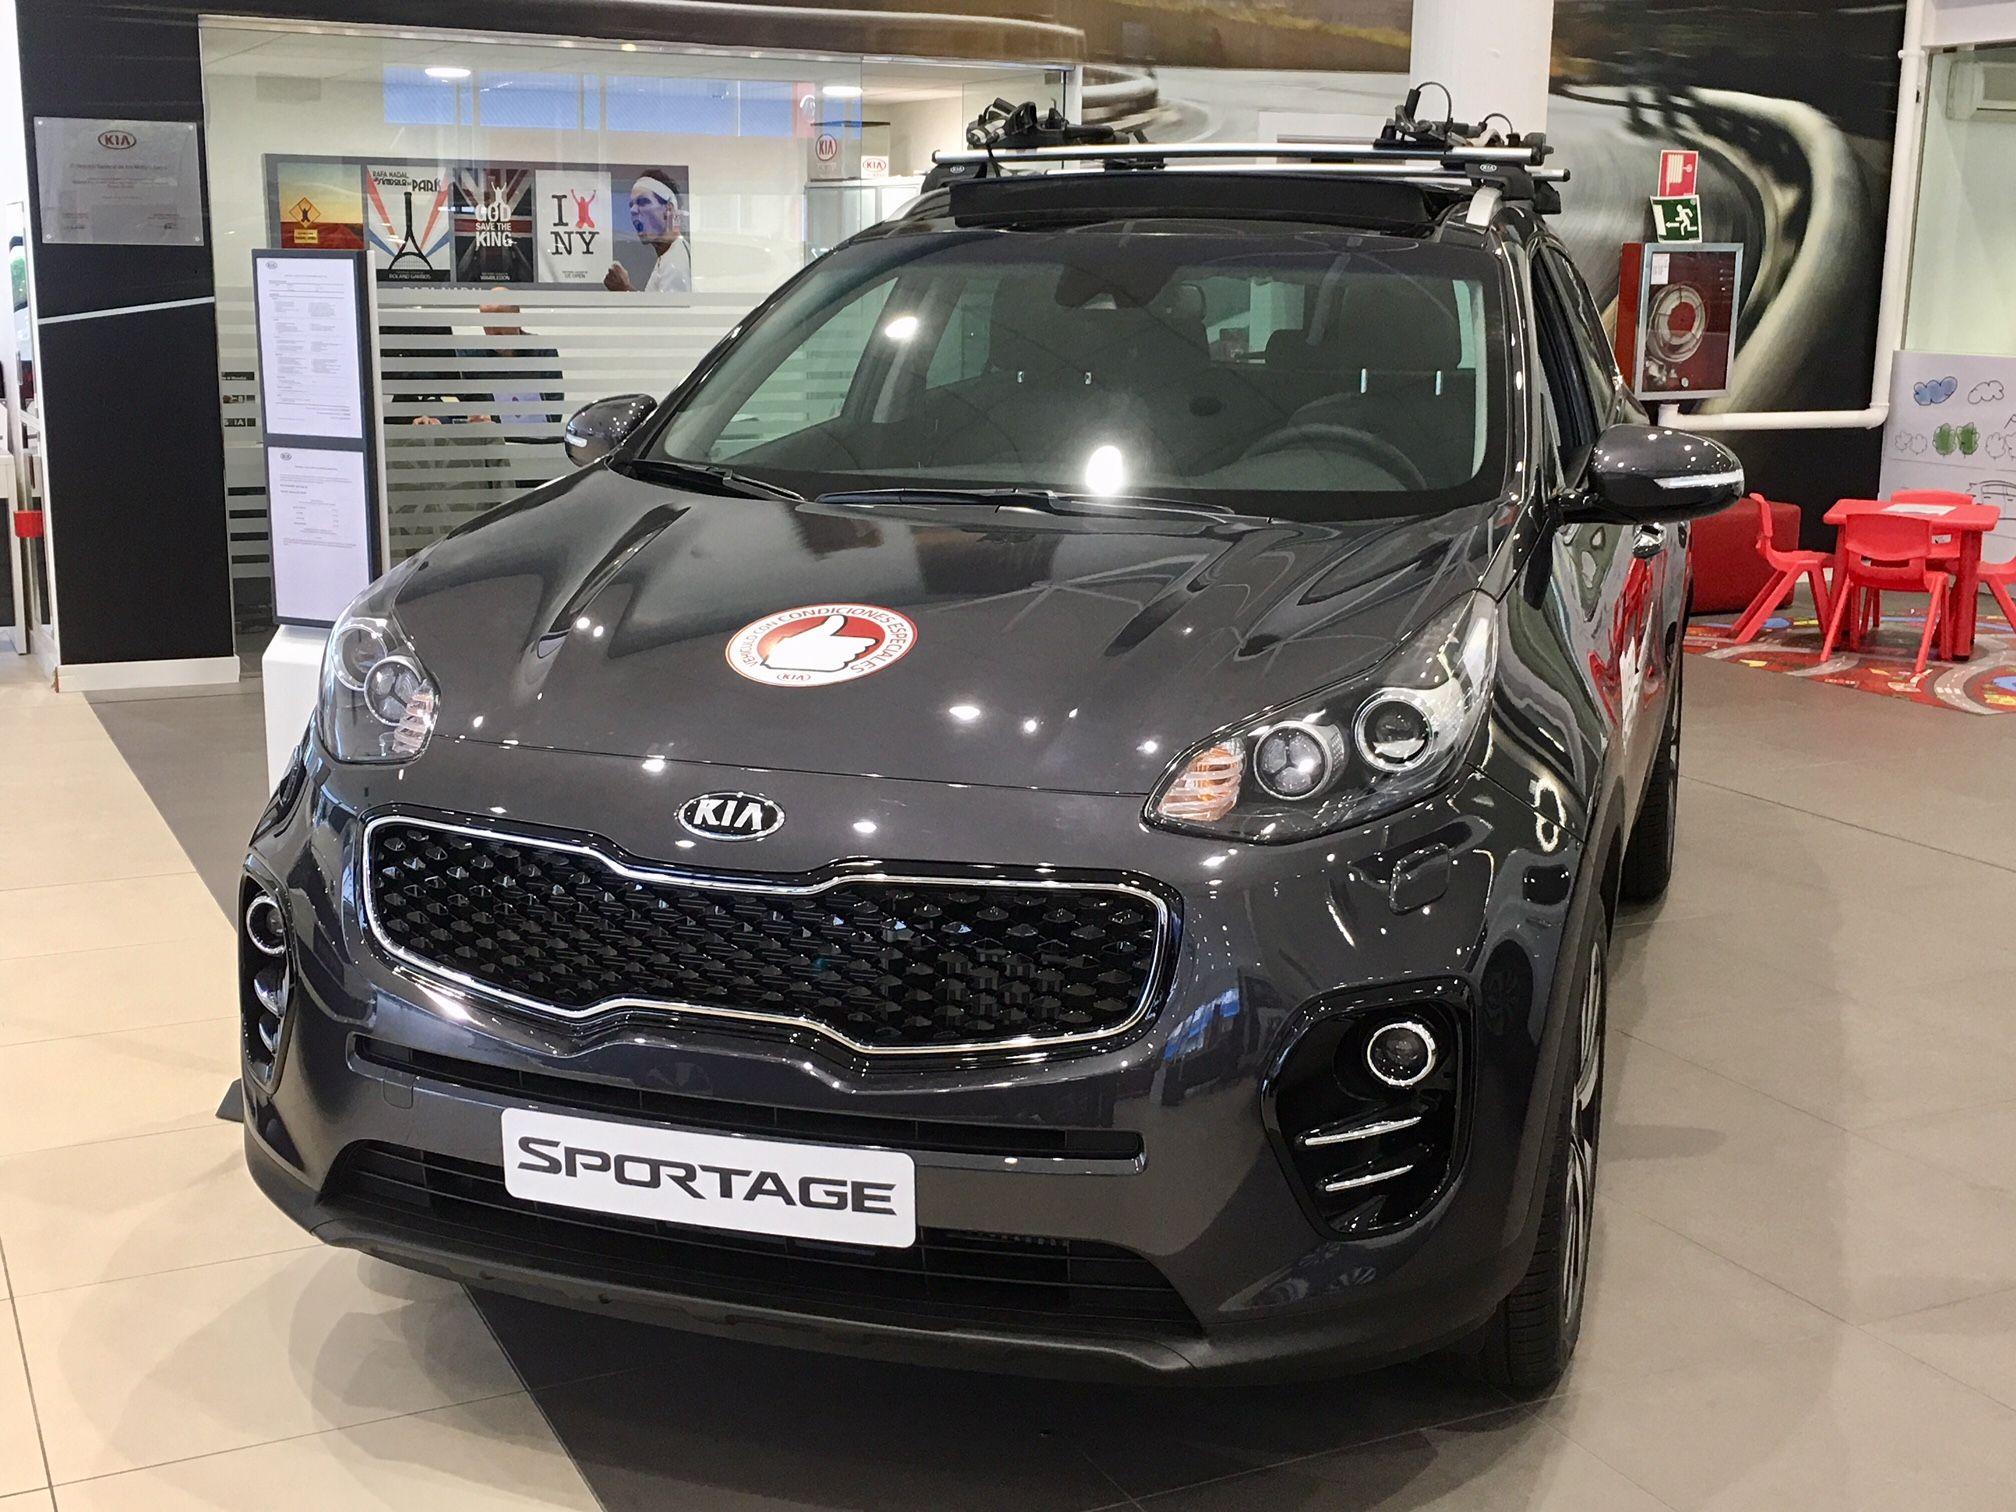 Oferta Kia Sportage X-Tech gasolina 136 CV por 19.690€